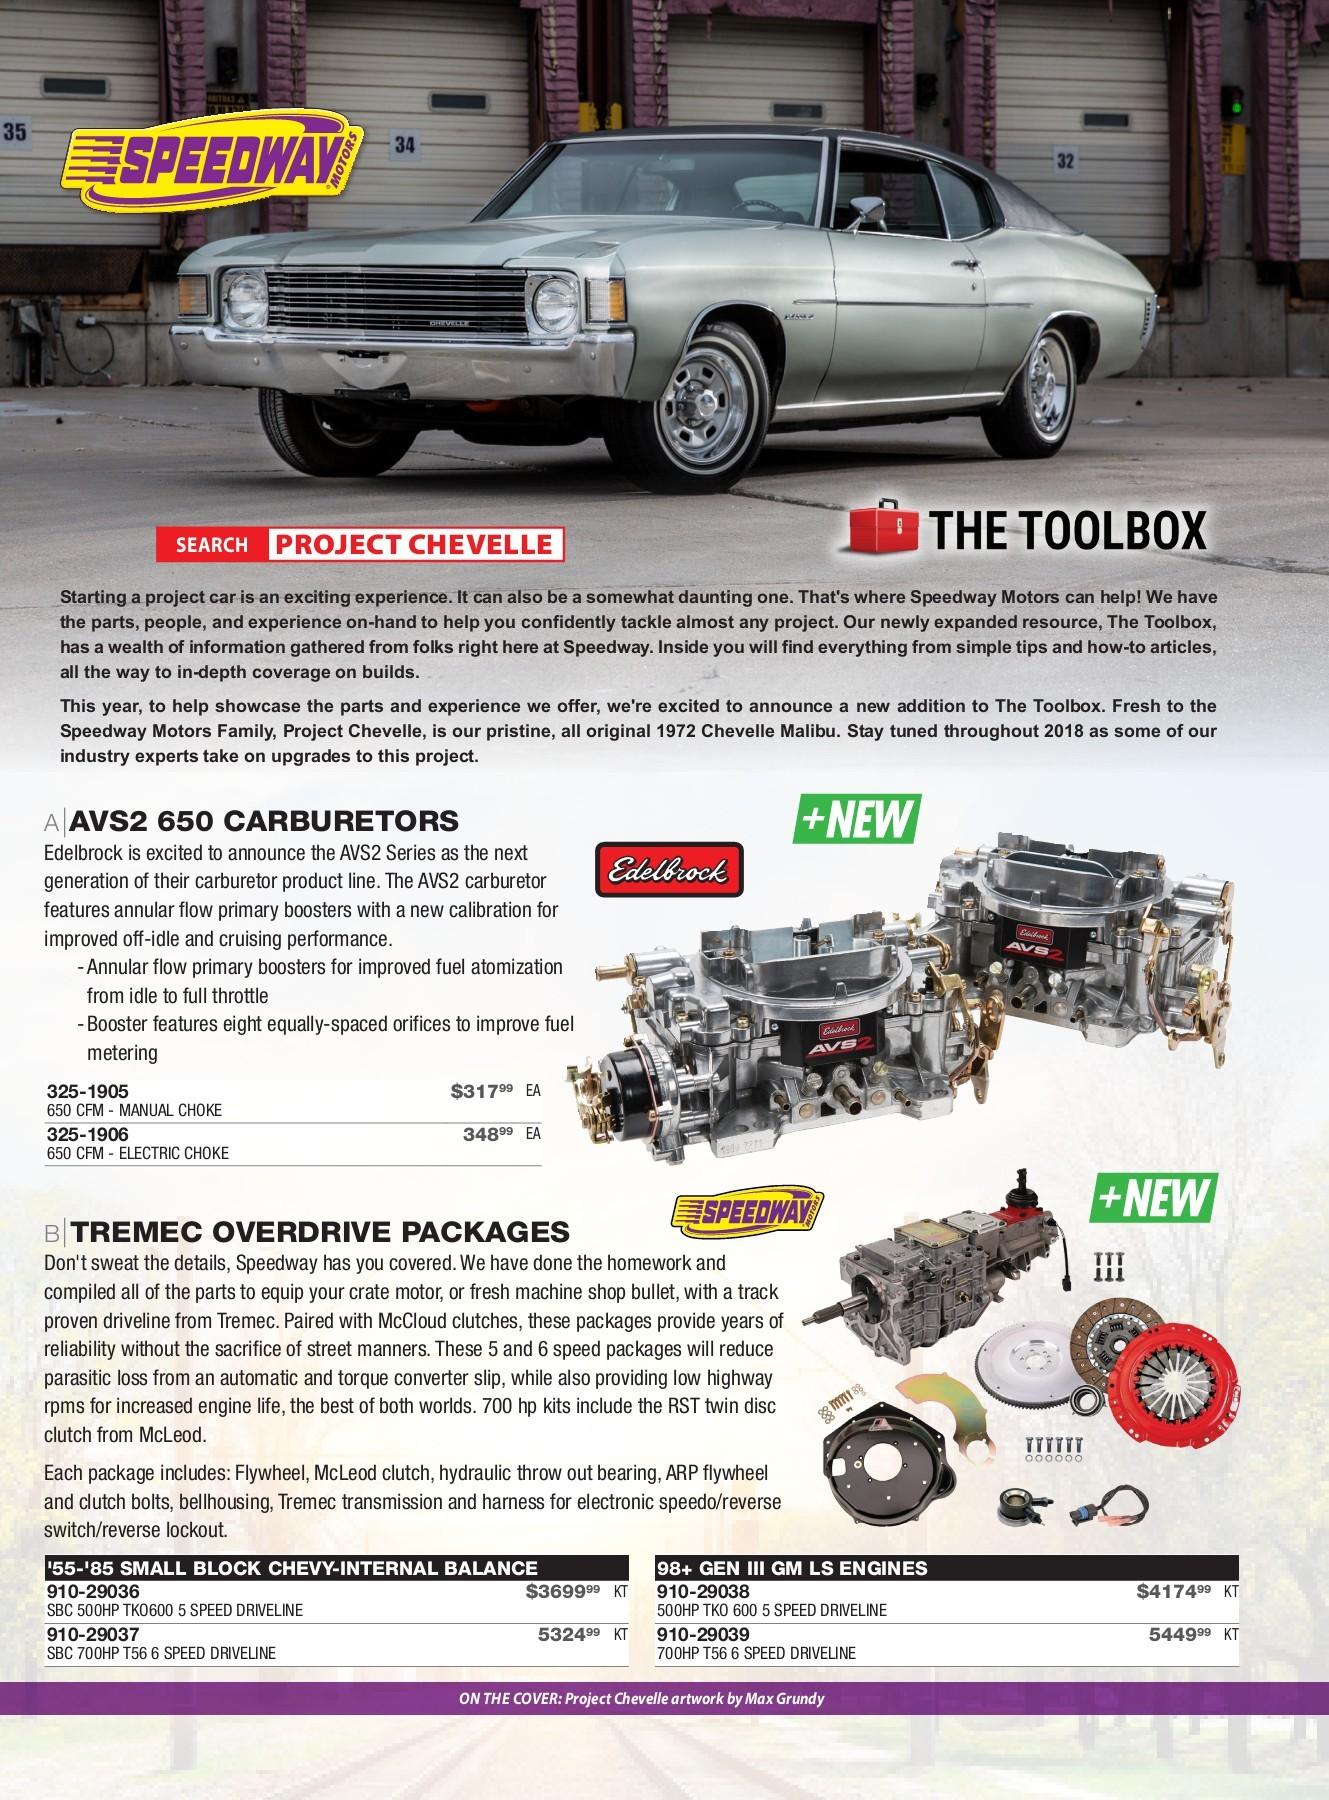 1958 Lincoln 430 383 Engine Mounts Motor Mount Set of 4 New